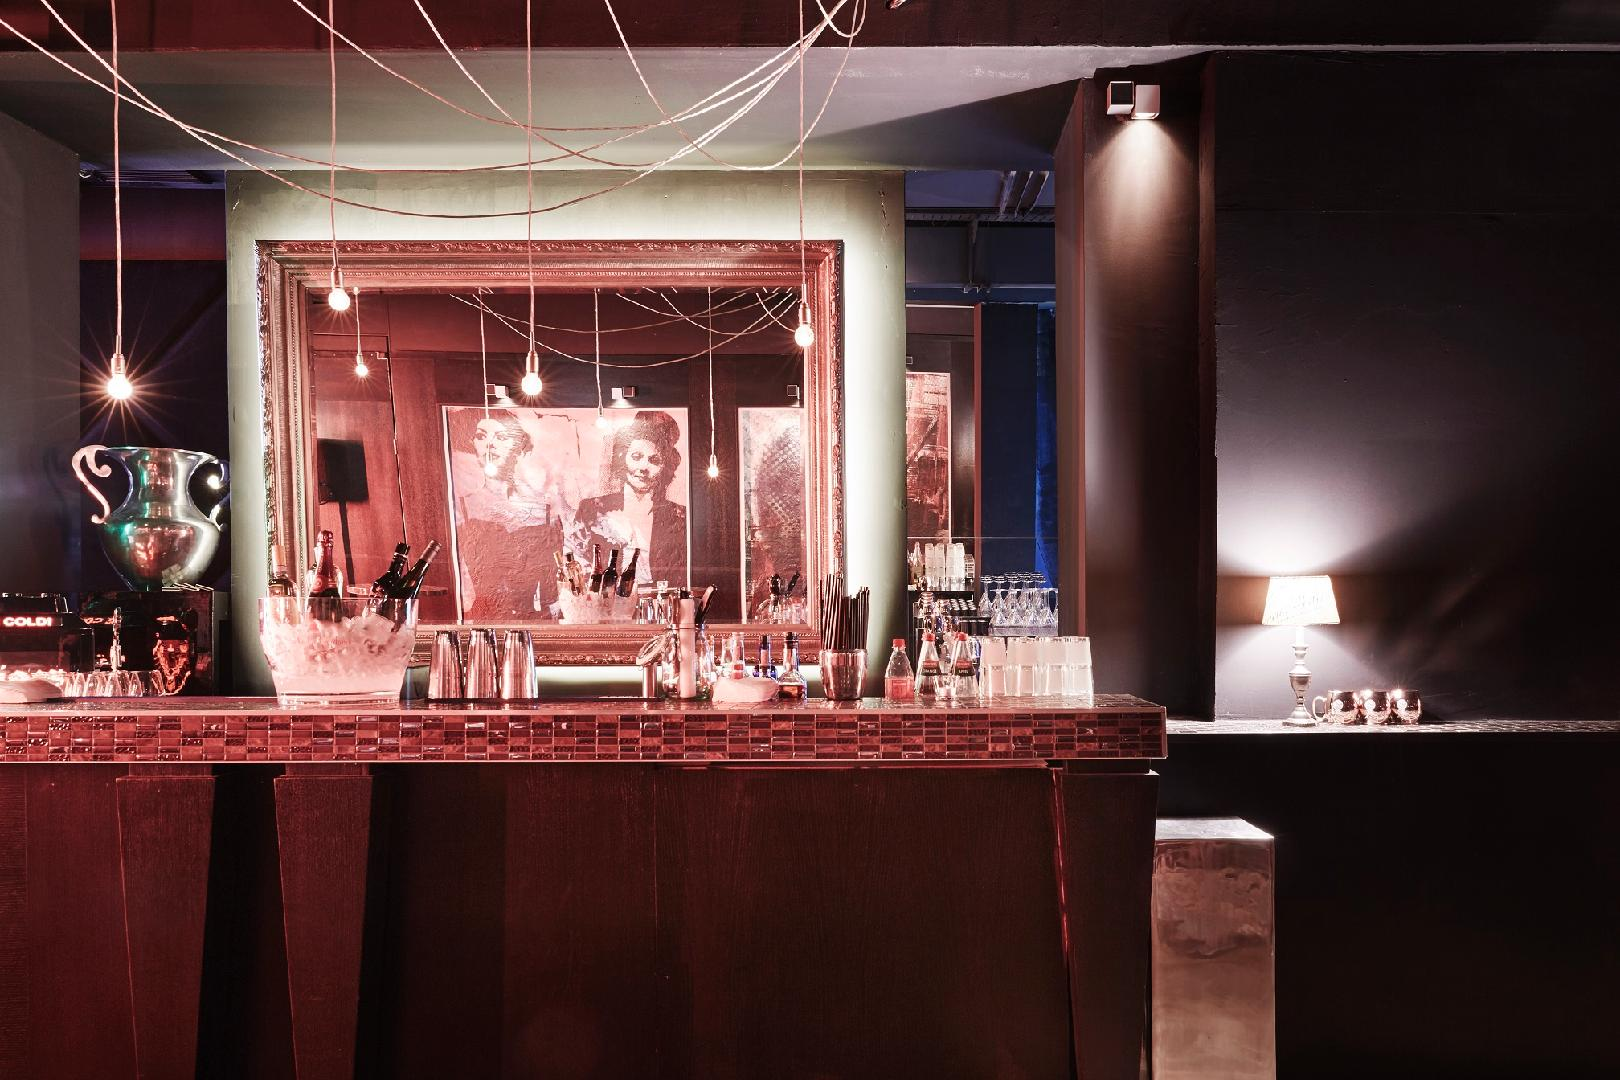 privateresi der raum f r private anl sse in der nachtresidenz bar eventlocation restaurant. Black Bedroom Furniture Sets. Home Design Ideas